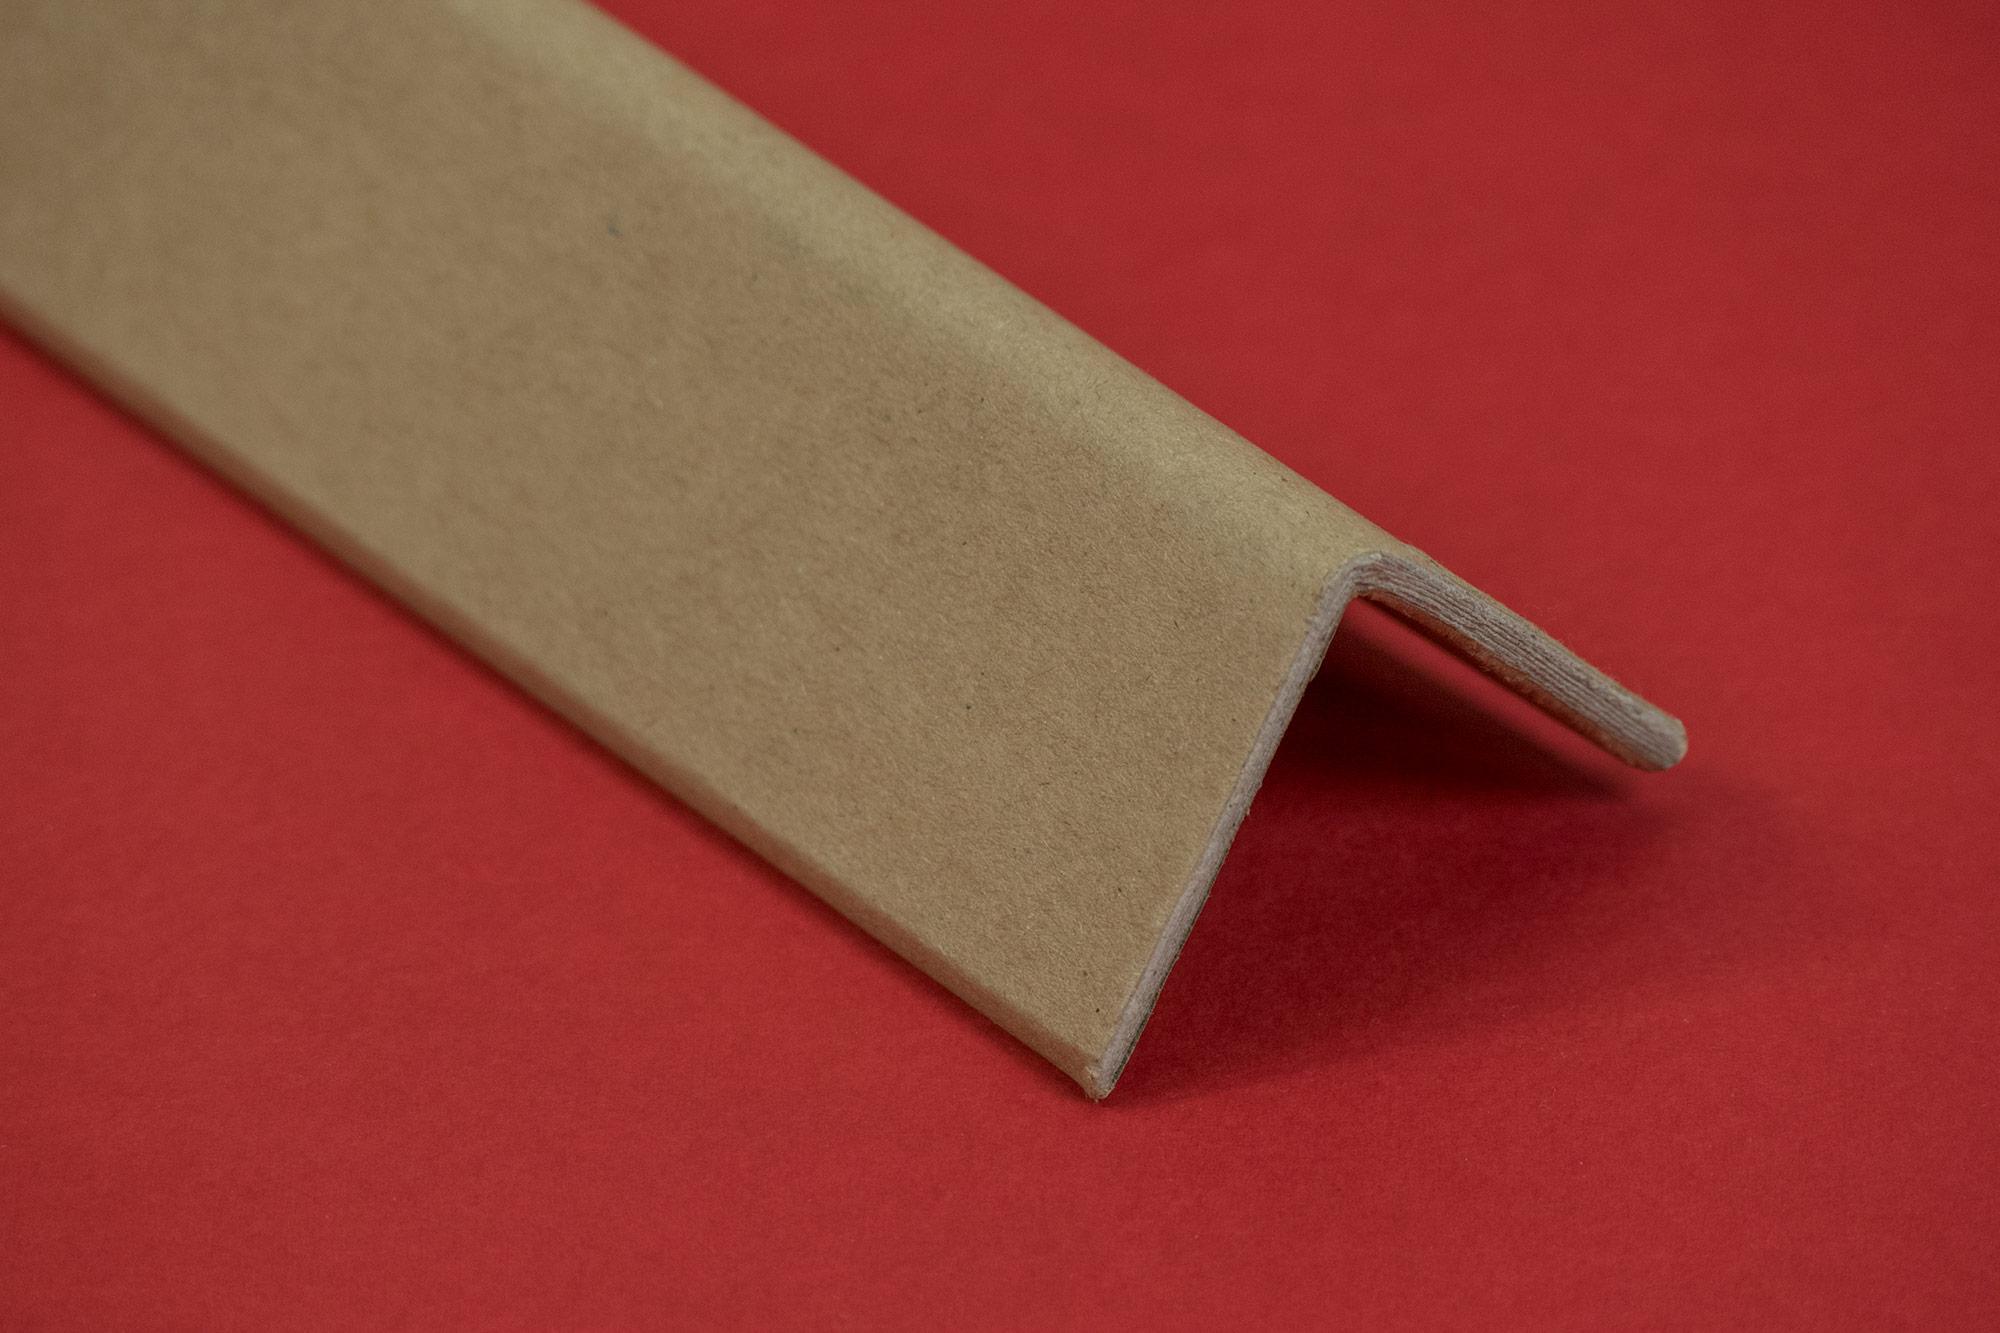 Paraspigoli veneta imballaggi - Mobili in cartone pressato ...